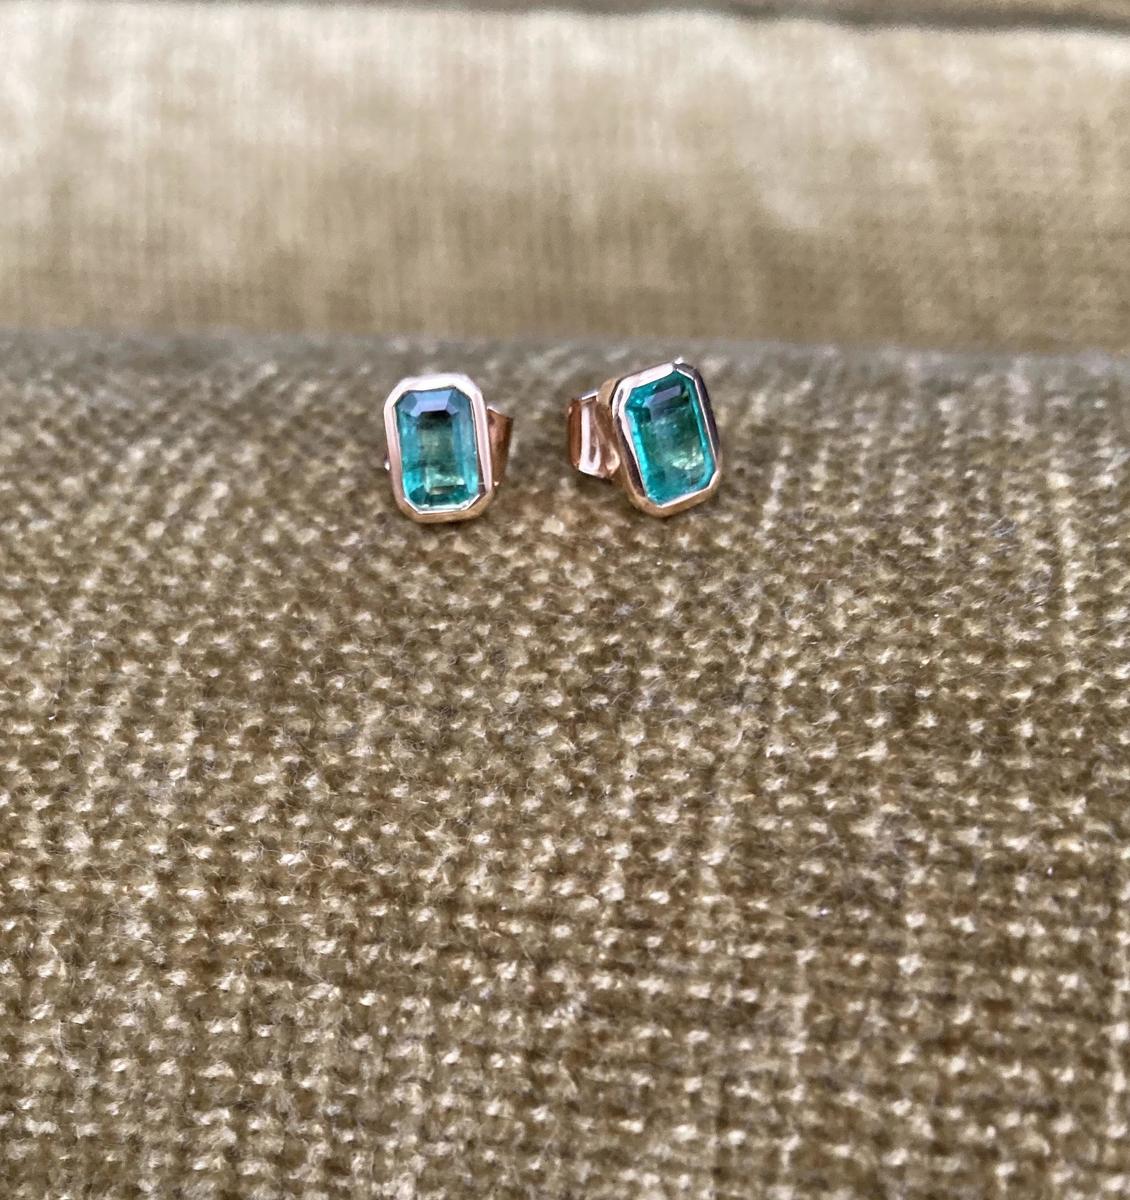 f:id:jewellerywanderlust:20210328015847j:plain